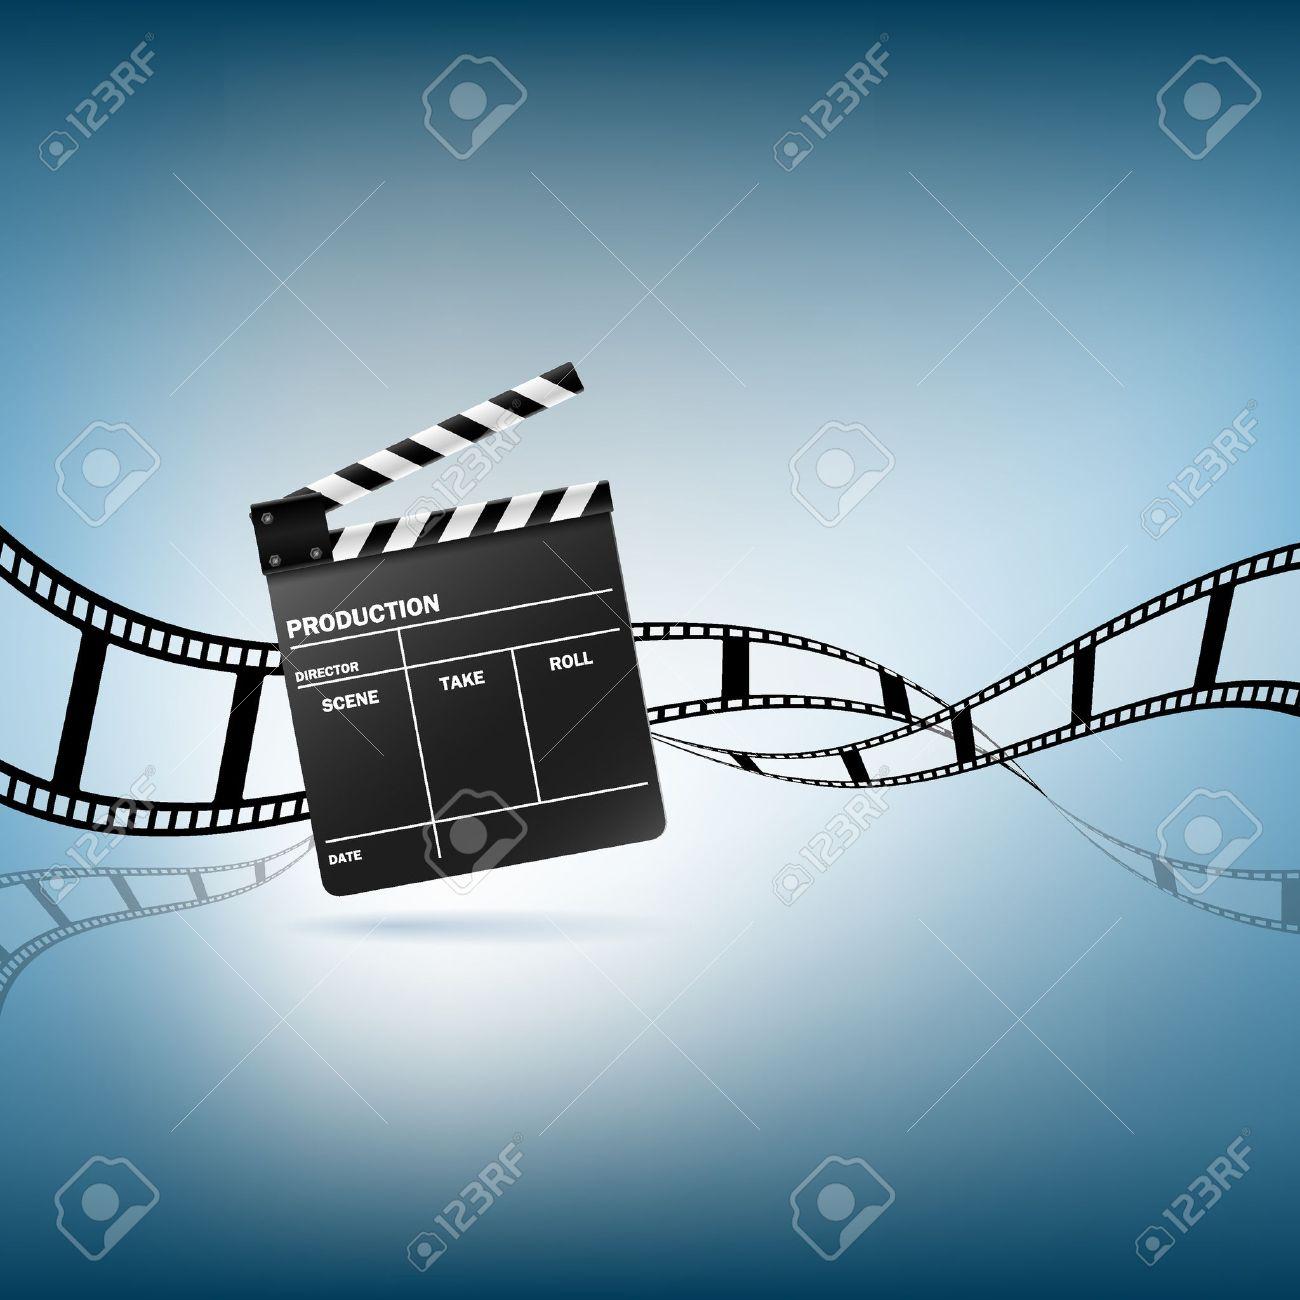 Cinema clapper and film vector illustration Stock Vector - 12269793